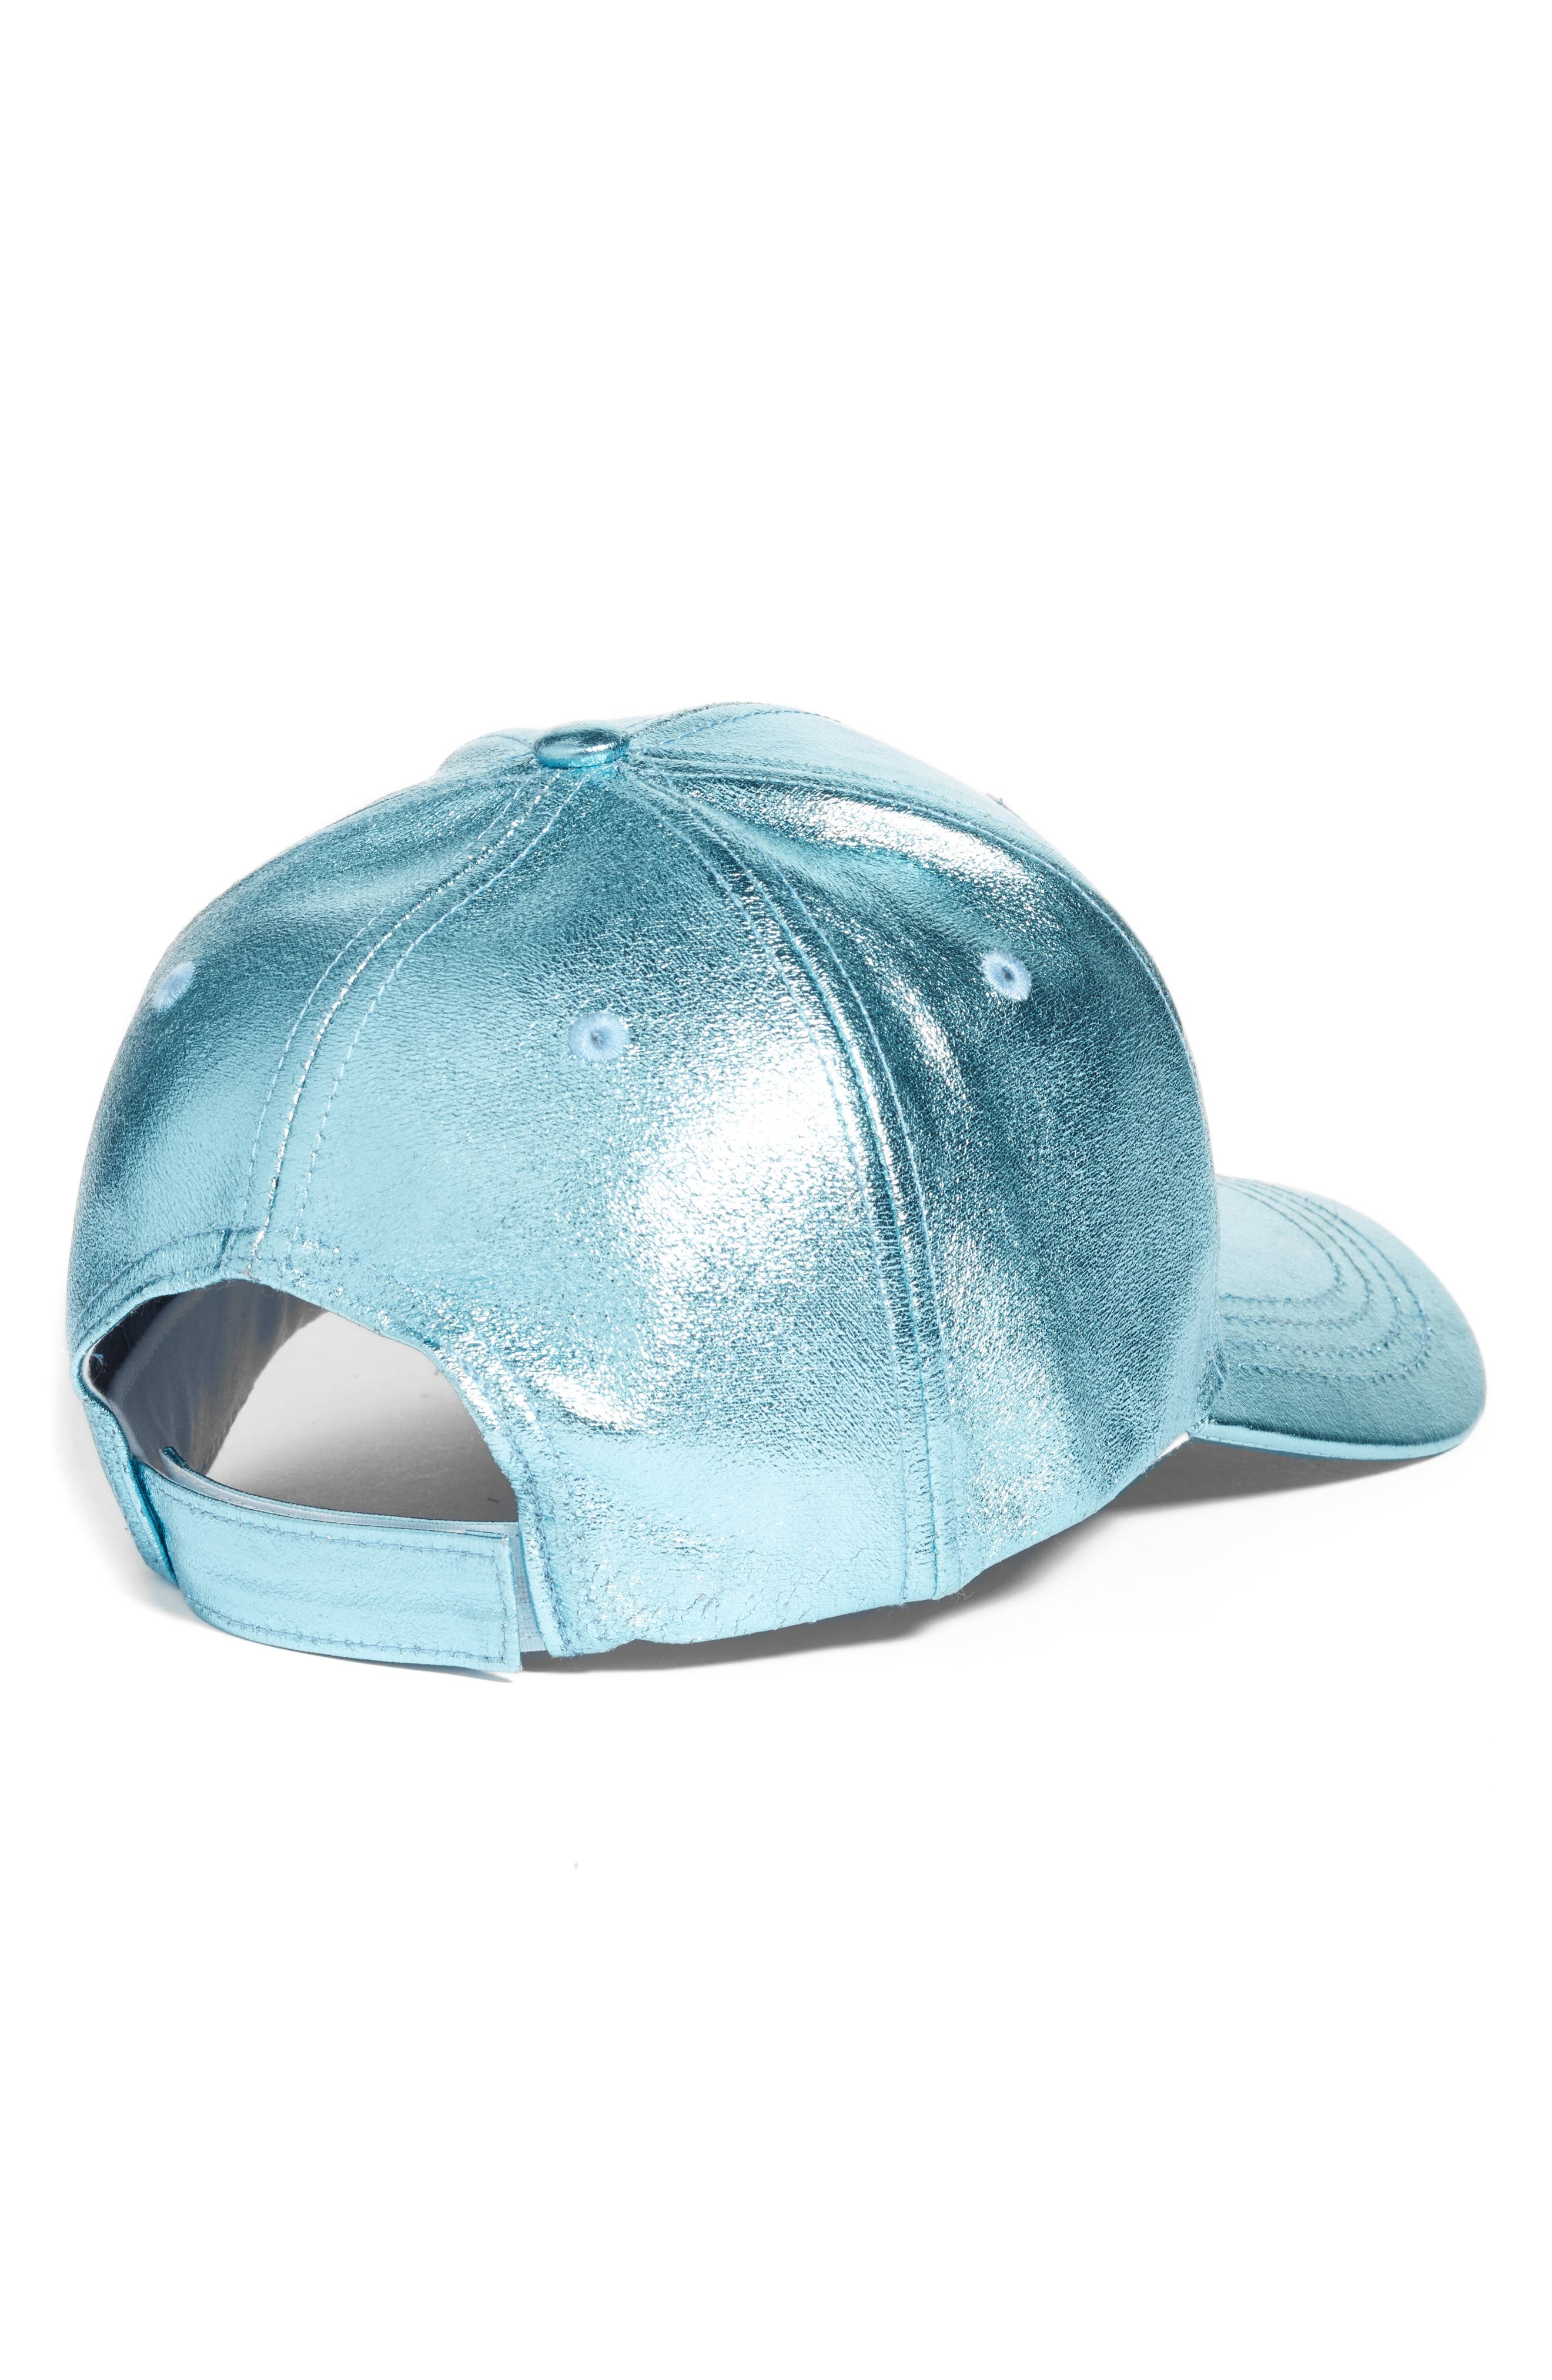 Crackled Metallic Baseball Cap,                             Alternate thumbnail 5, color,